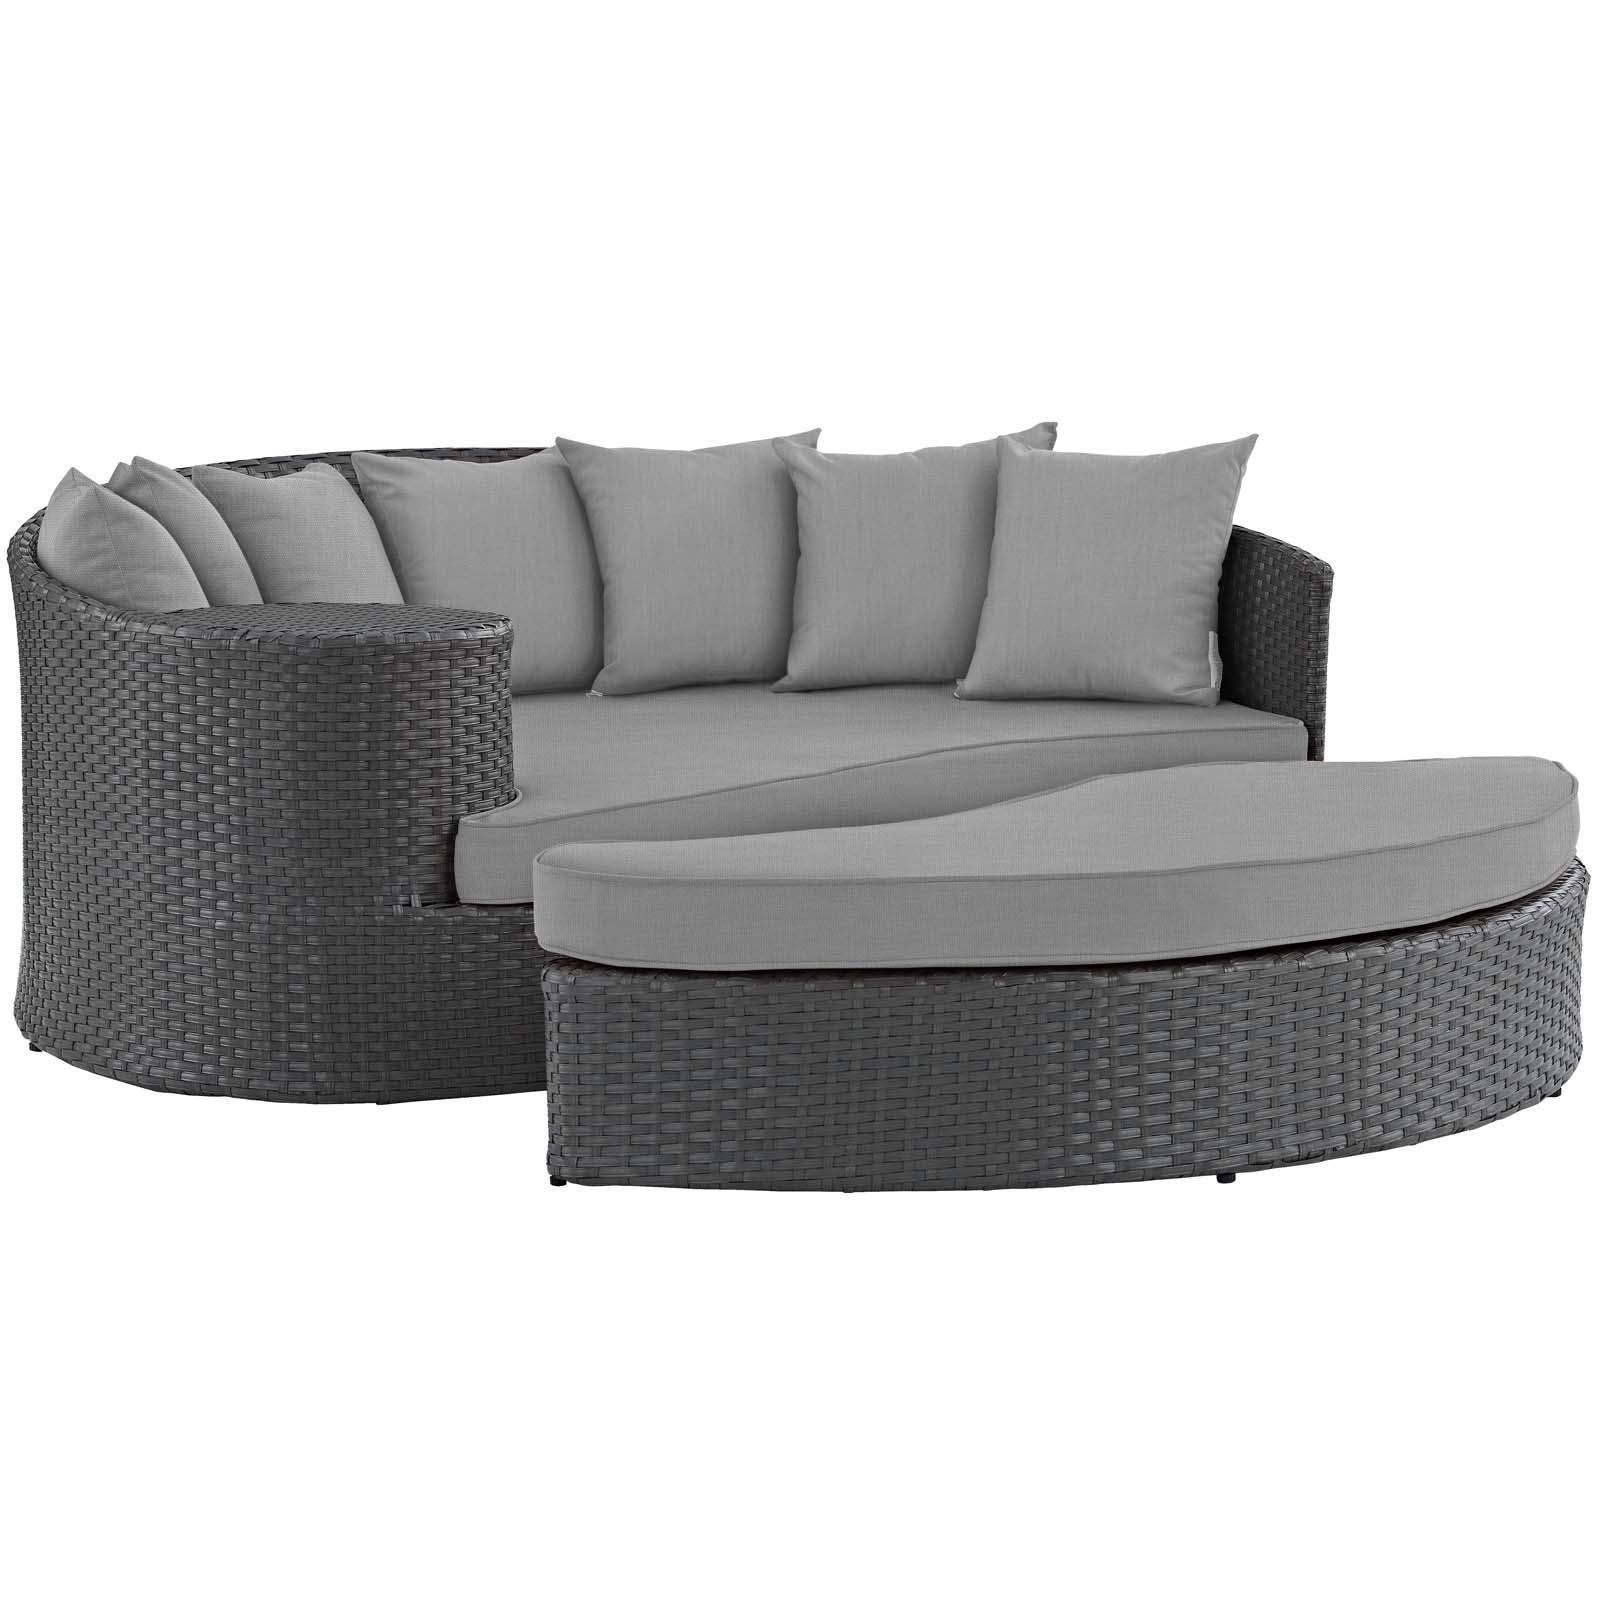 Modern Contemporary Urban Design Outdoor Patio Balcony Garden Furniture Lounge Daybed Sofa Bed, Sunbrella Rattan Wicker, Grey Gray